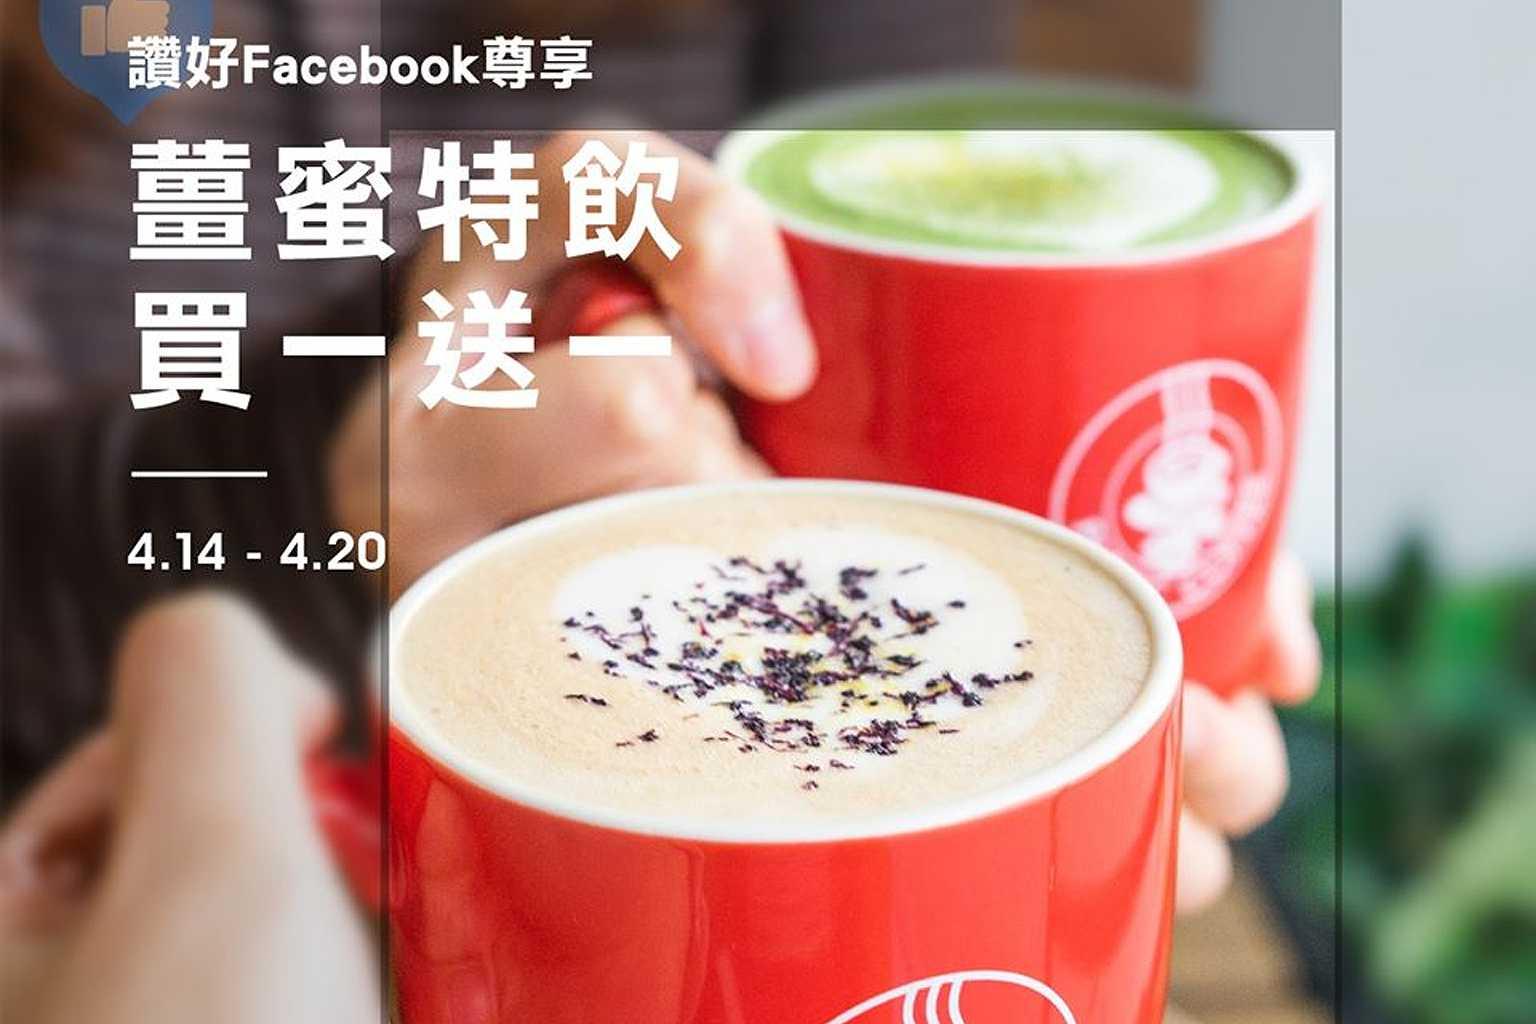 Pacific Coffee 春日暖心養生系列特飲「買一送一」(優惠至 2020 年 4 月 20 日) – GetJetso 香港著數優惠網